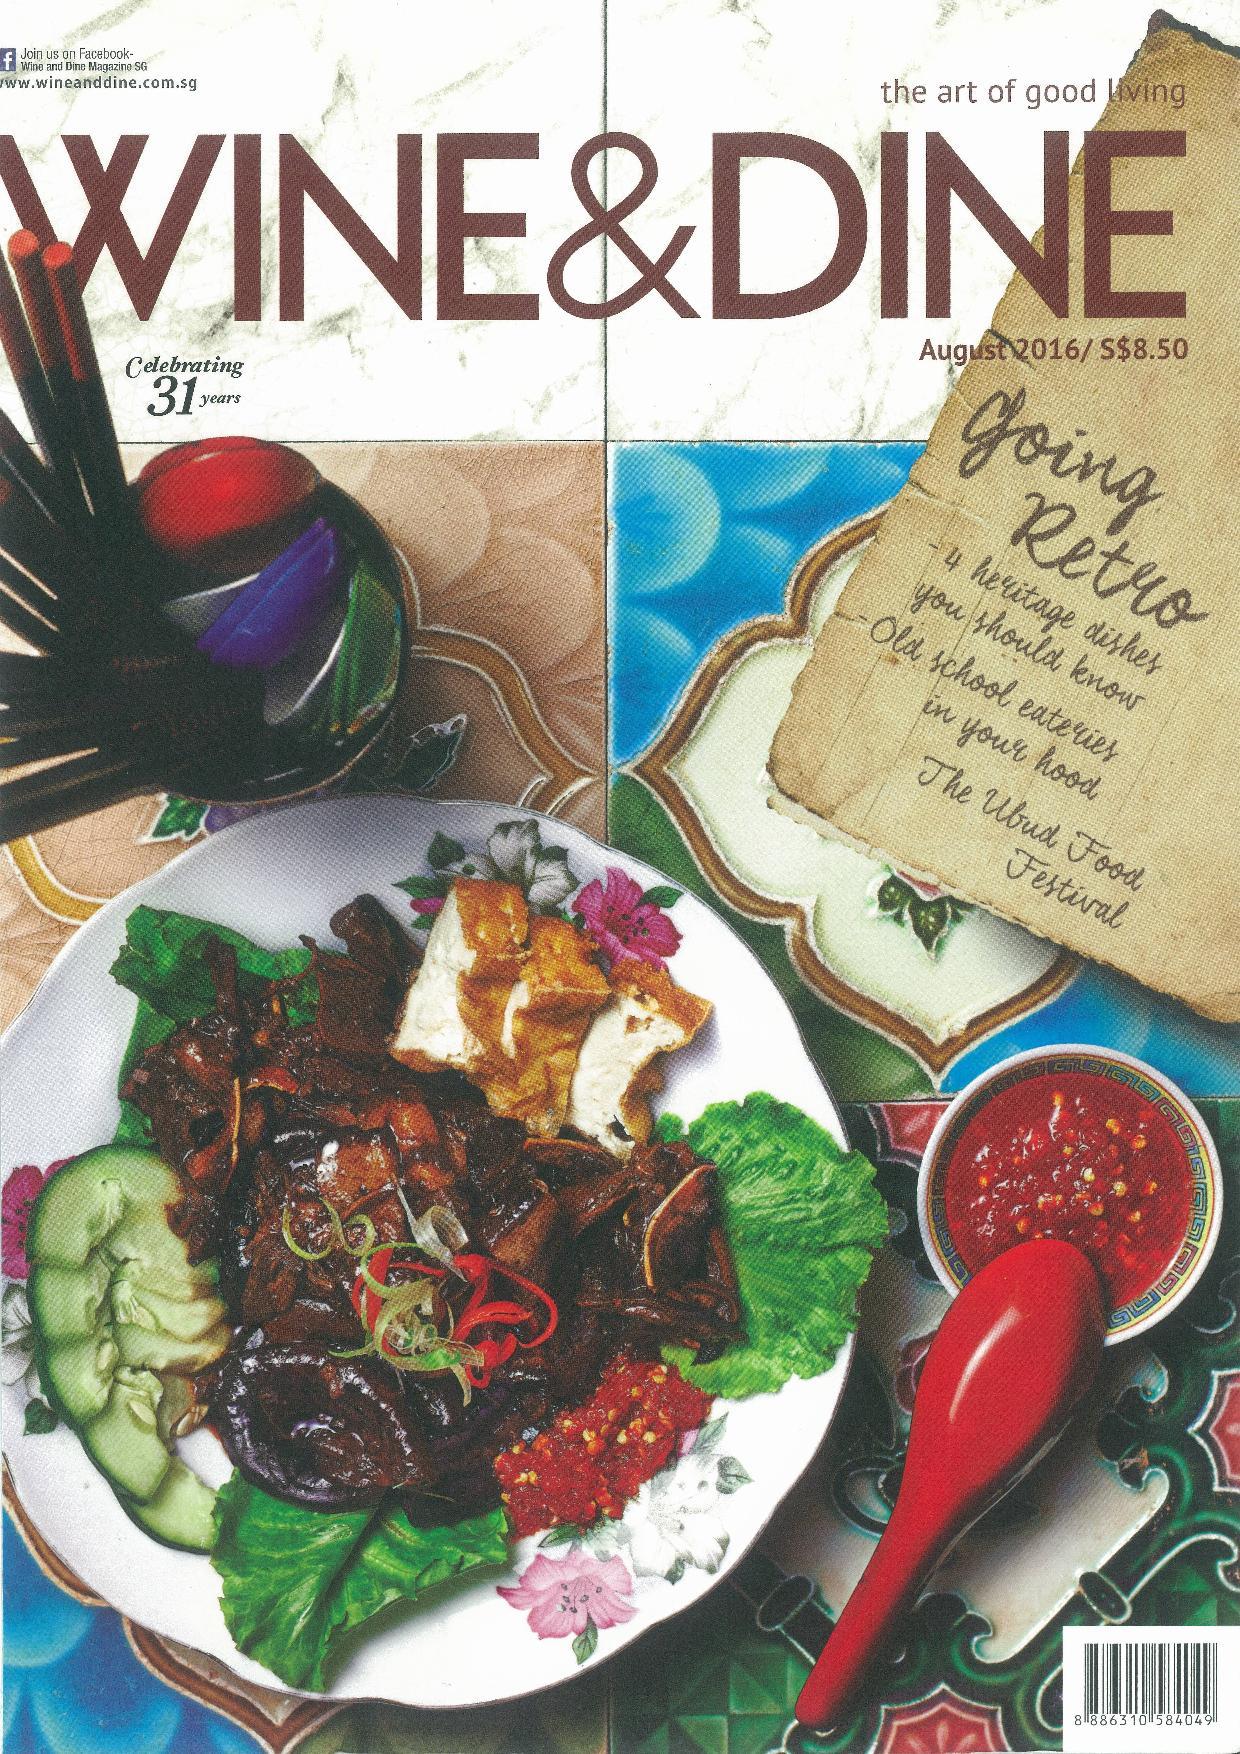 17 - Wine & Dine August 2016-page-001.jpg